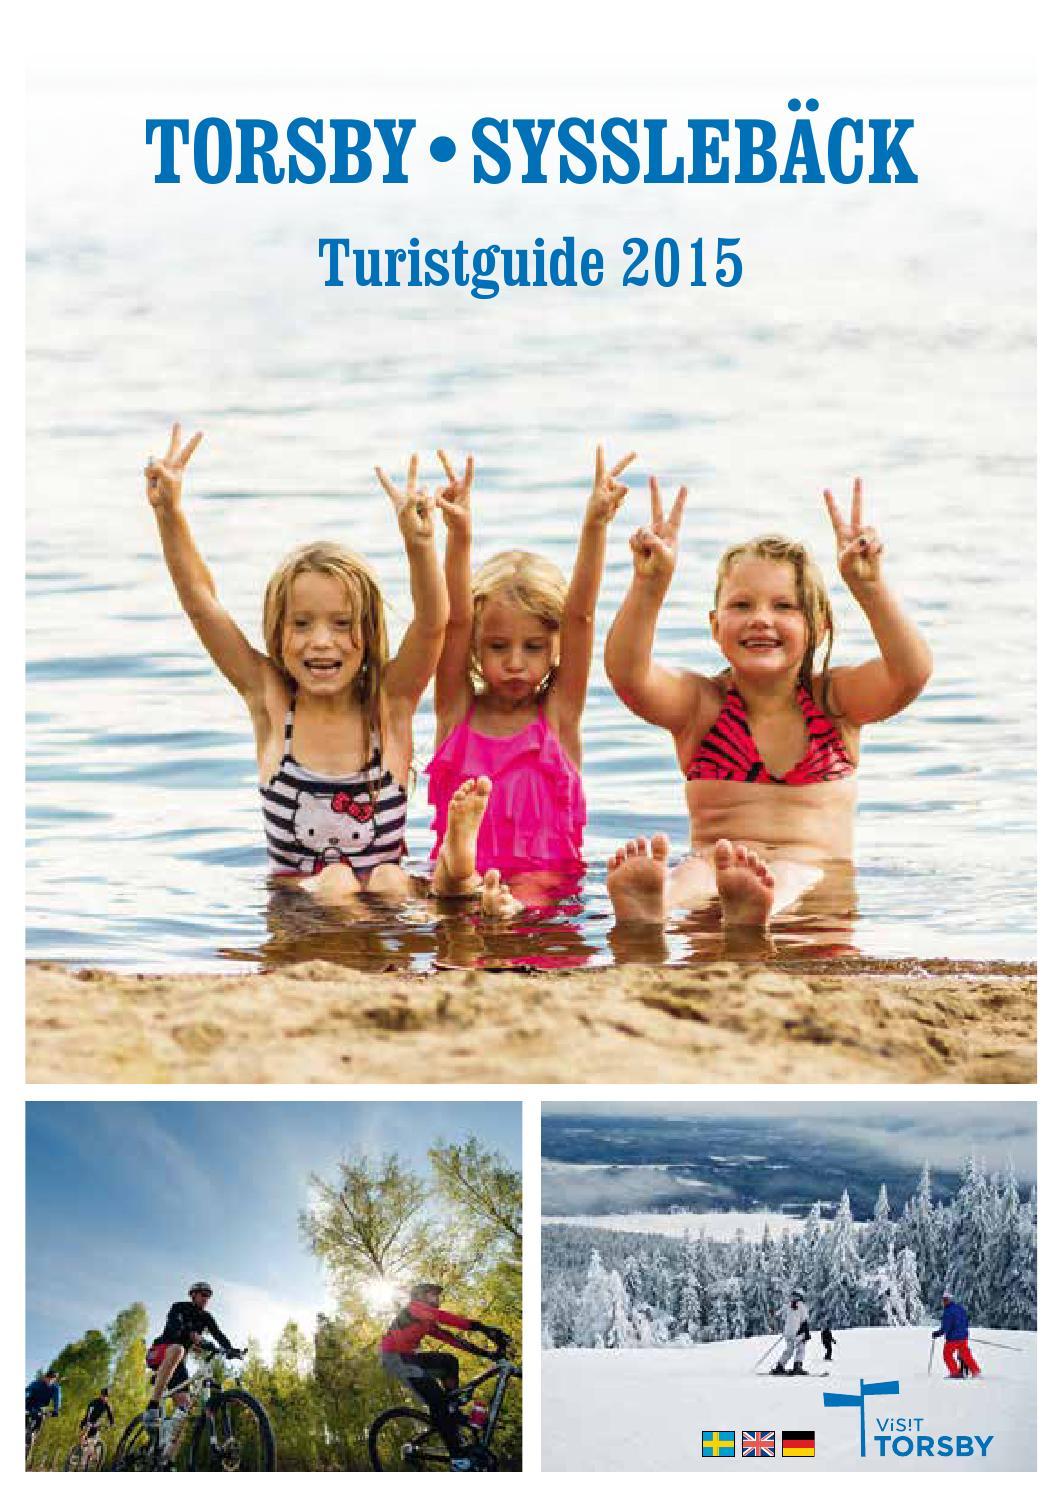 Visa inlgg - micke_bjb   Anbytarforum - Rtter